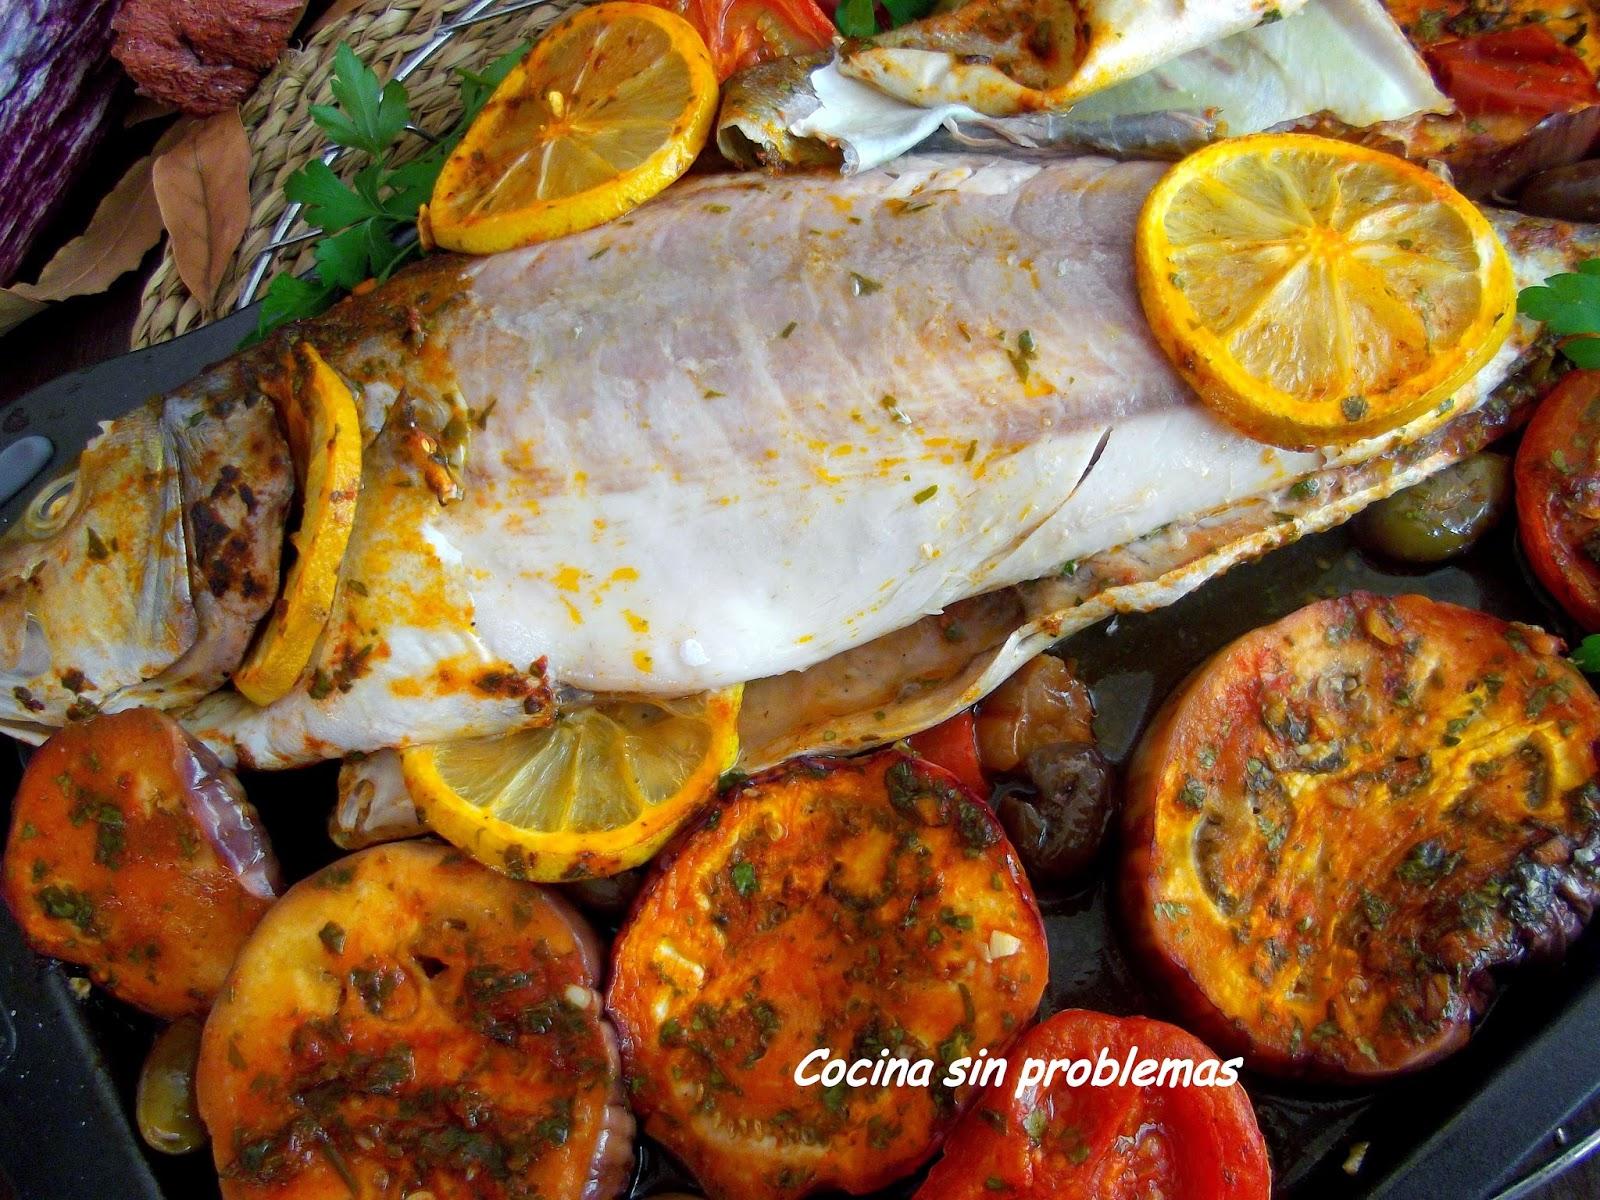 Cocina sin problemas pescado al horno m chermel - Cocina al horno ...